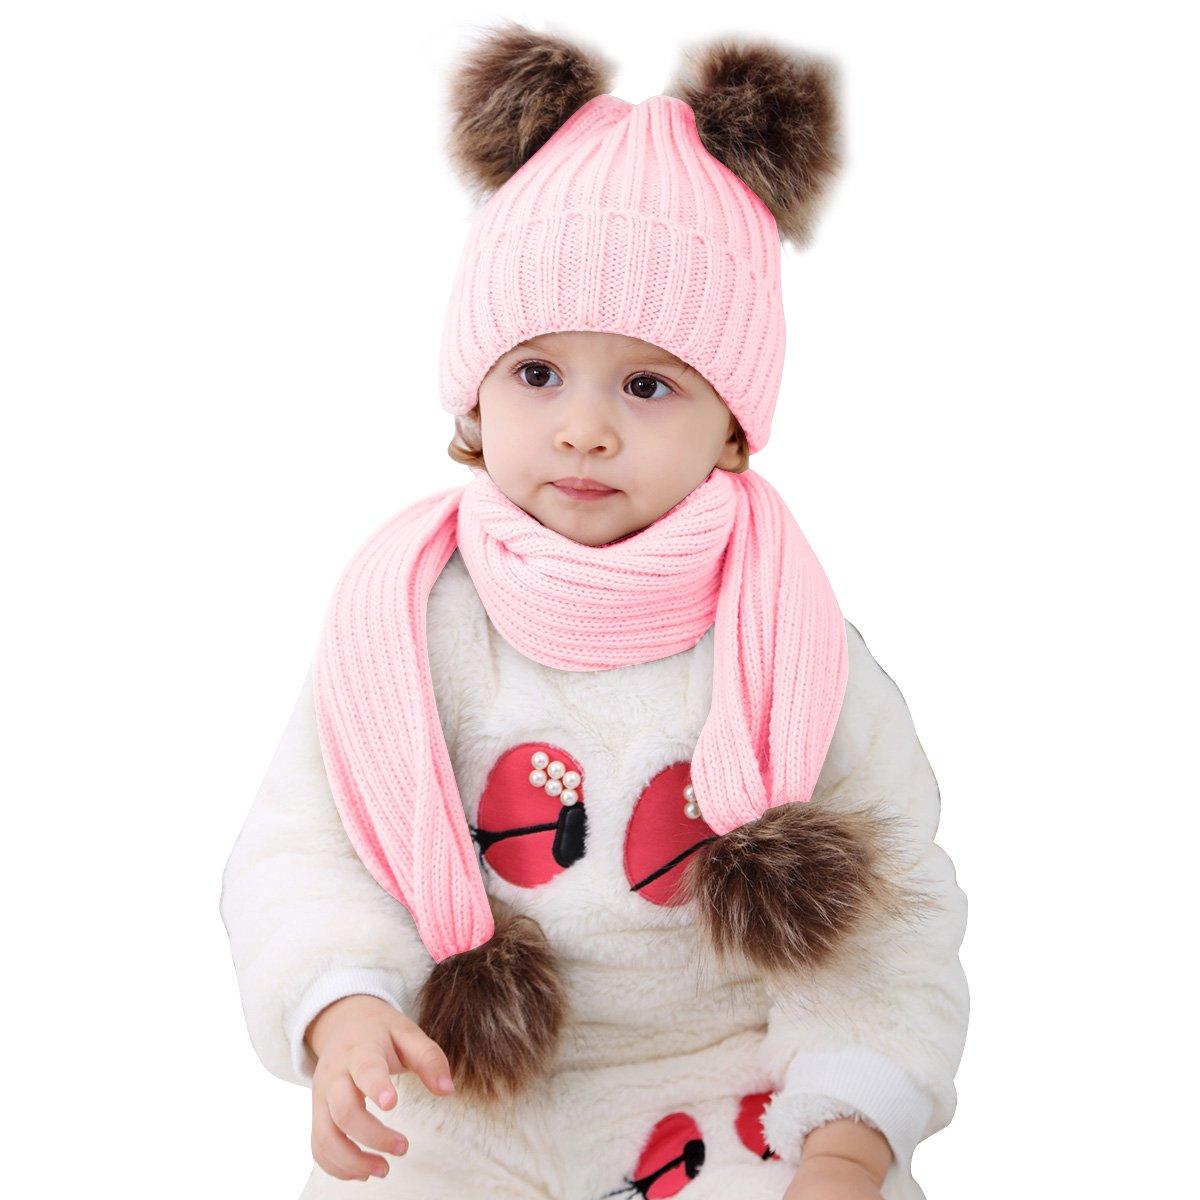 2pcs Baby Girls Boys Winter Hat Scarf Set, Infant Toddler Newborn Baby Knit Warm Beanie Cap Ski Hat + Scarf with Pom Pom Ball (Hat+Scarf Pink)